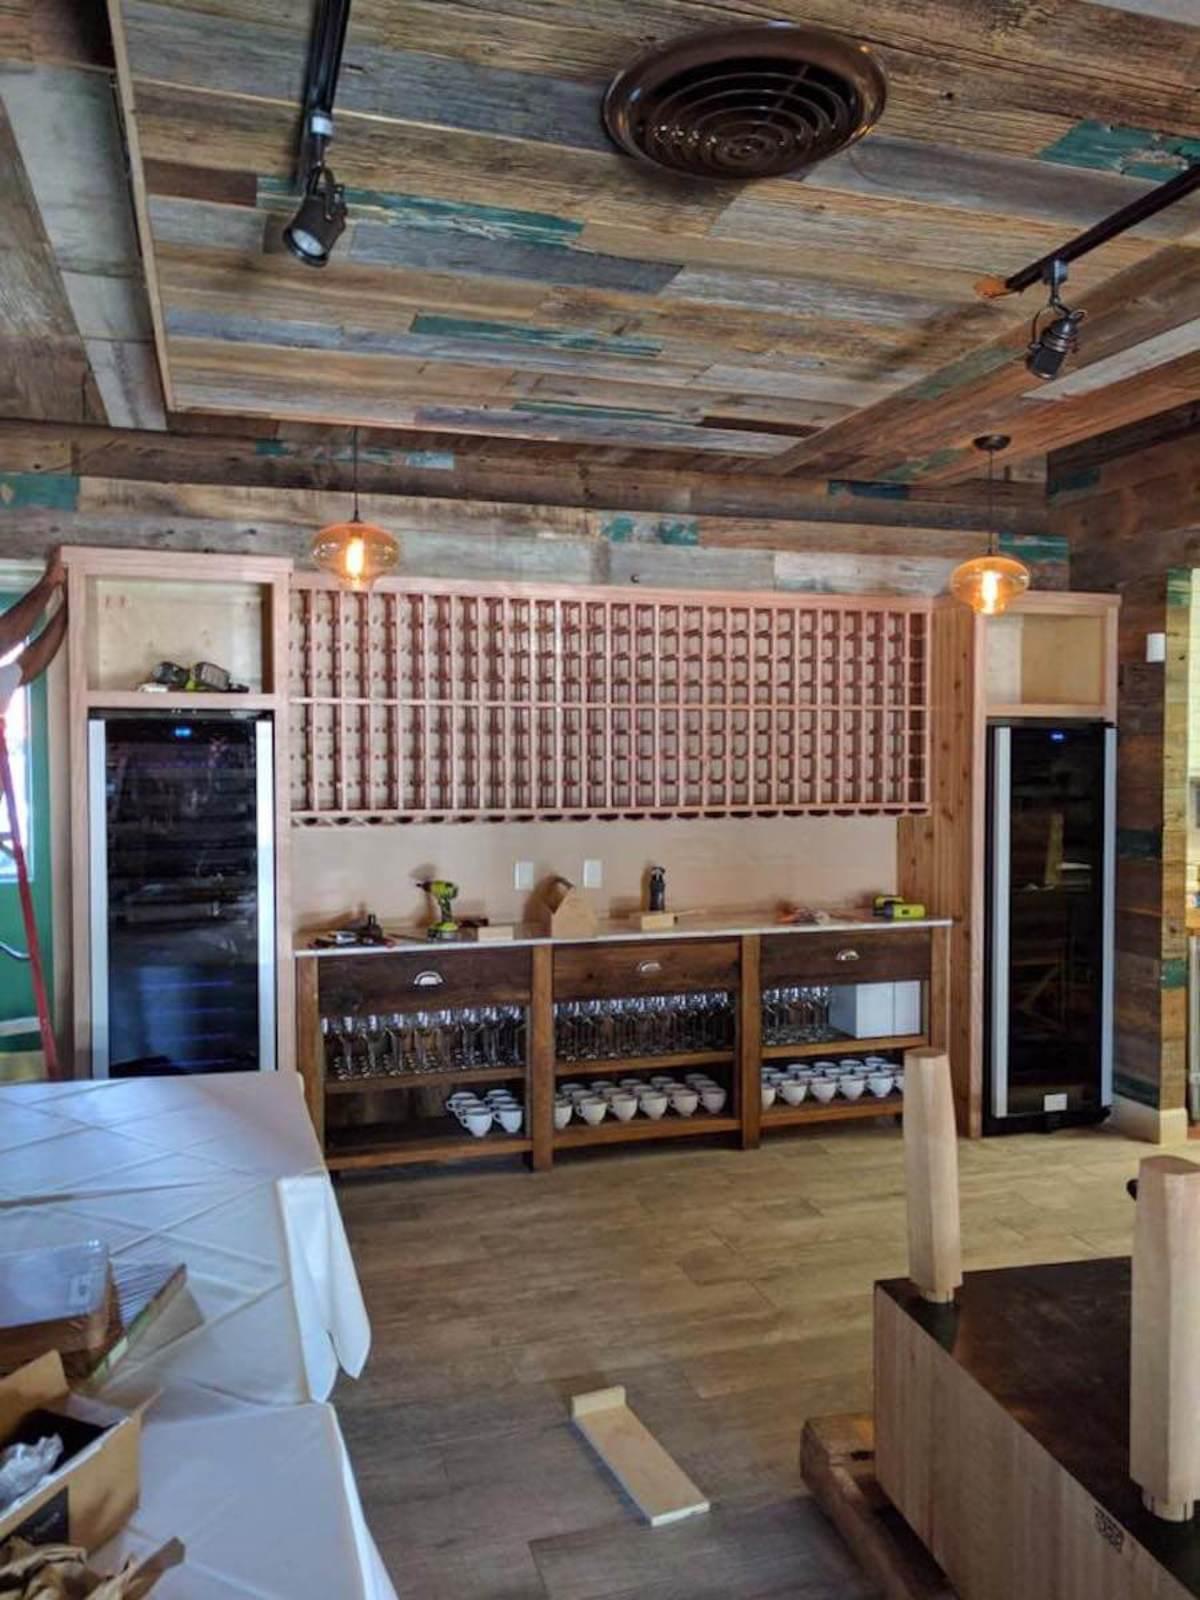 Killen's STQ wine storage